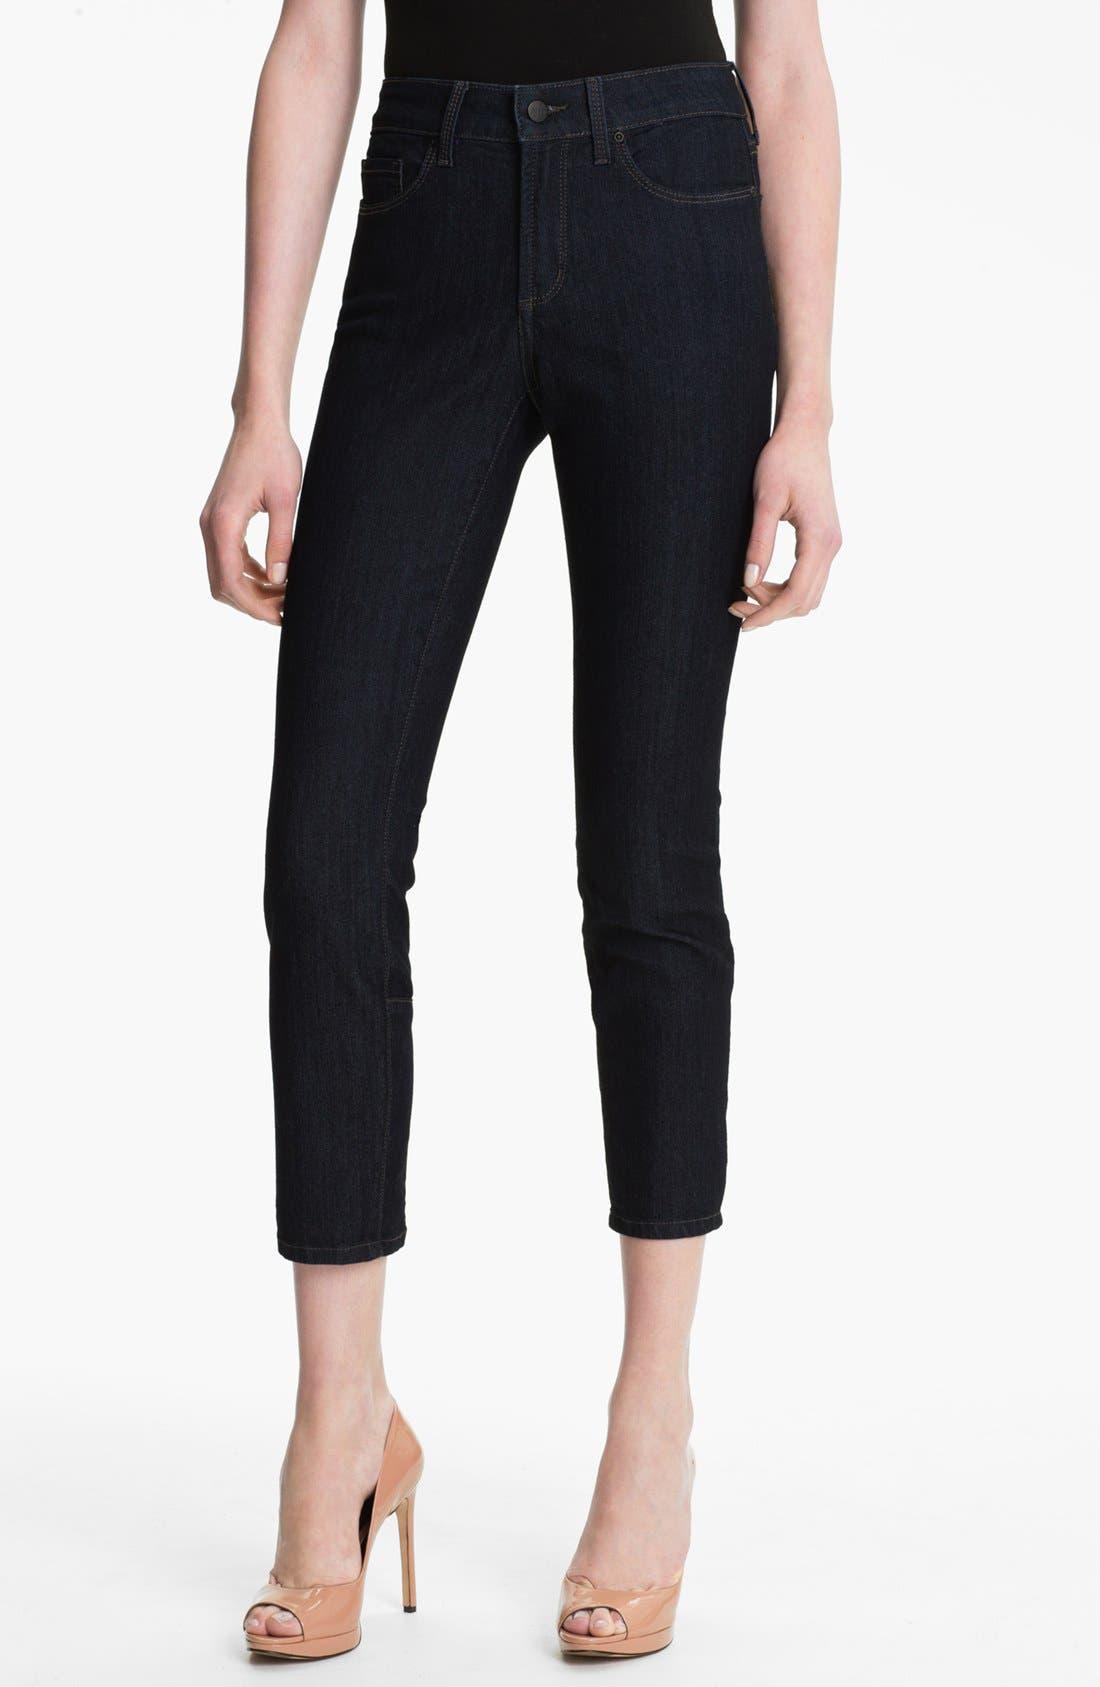 Alternate Image 1 Selected - NYDJ 'Jill' Zip Hem Stretch Crop Jeans (Petite)